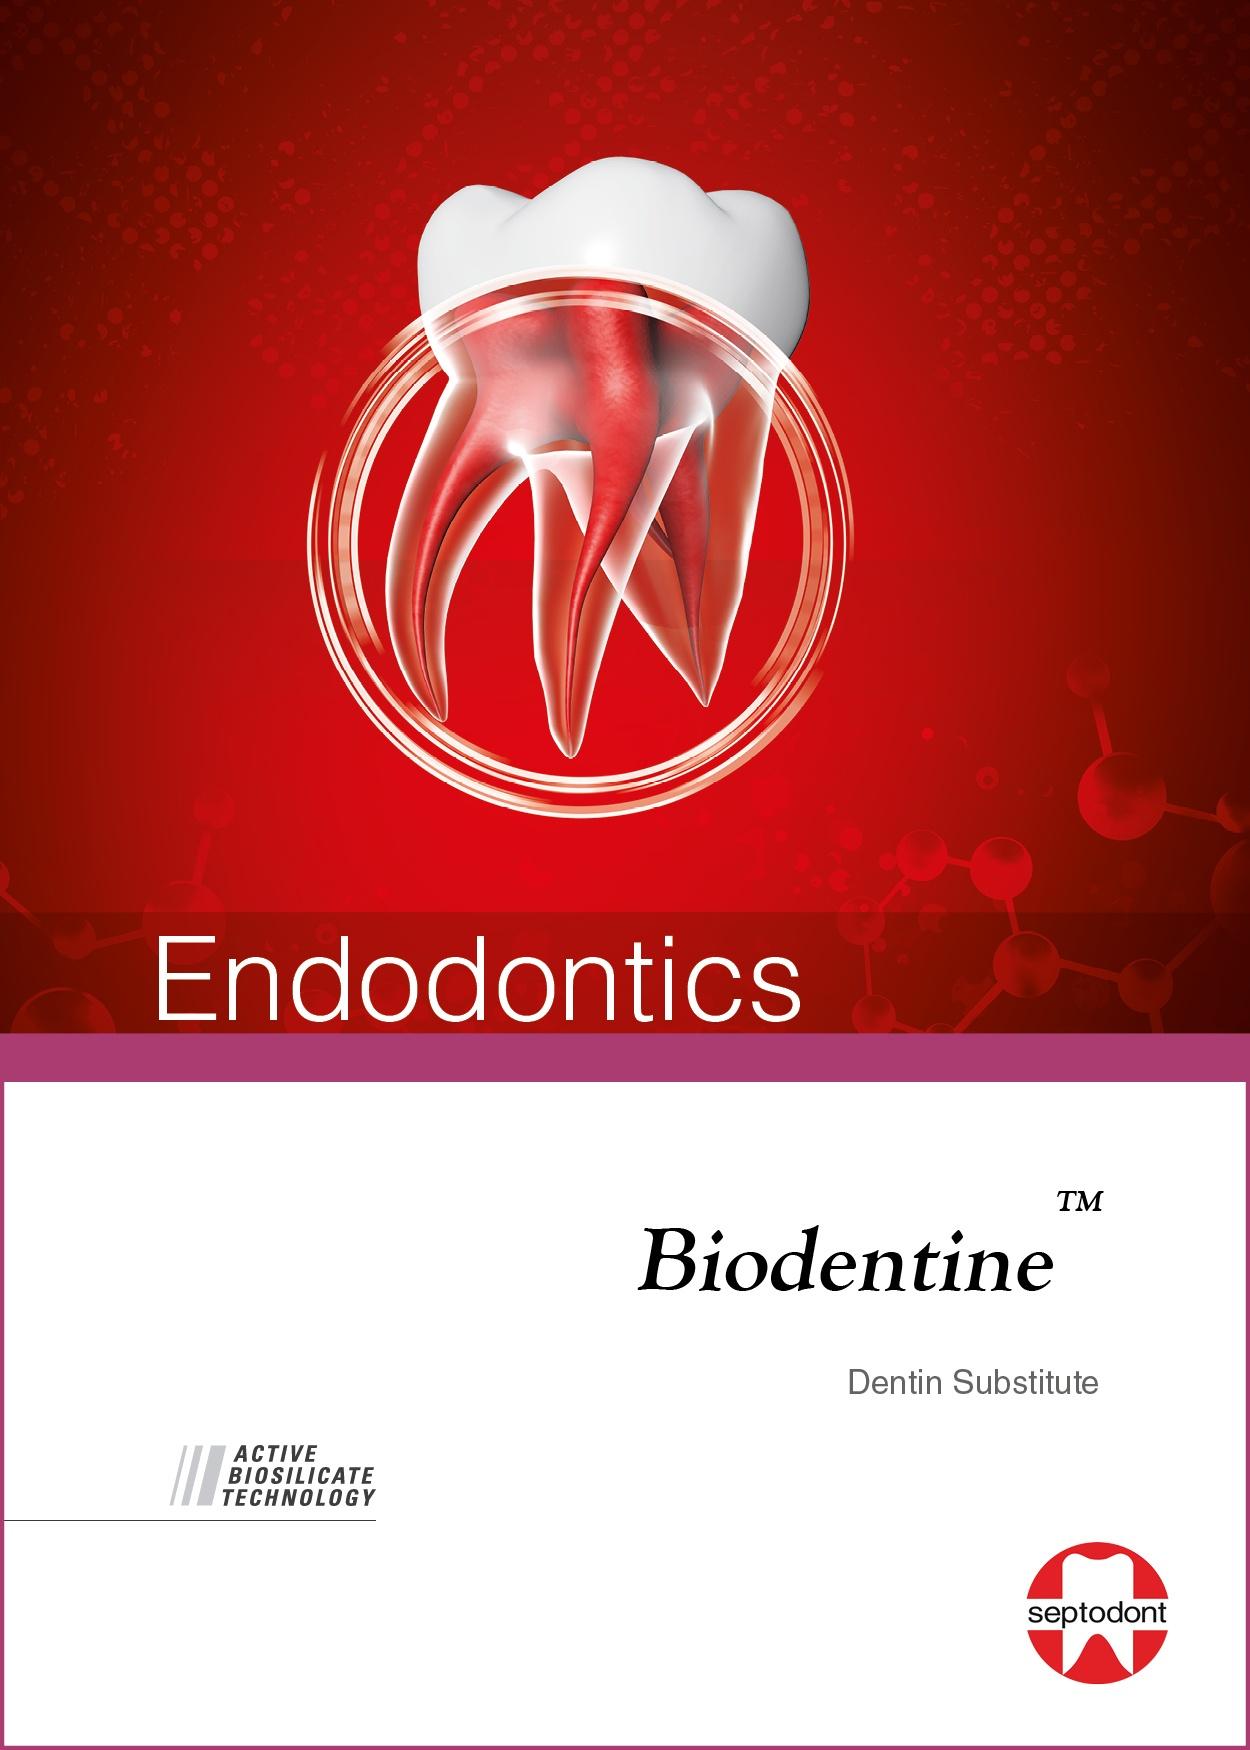 Biodentine - Endodontics brochure